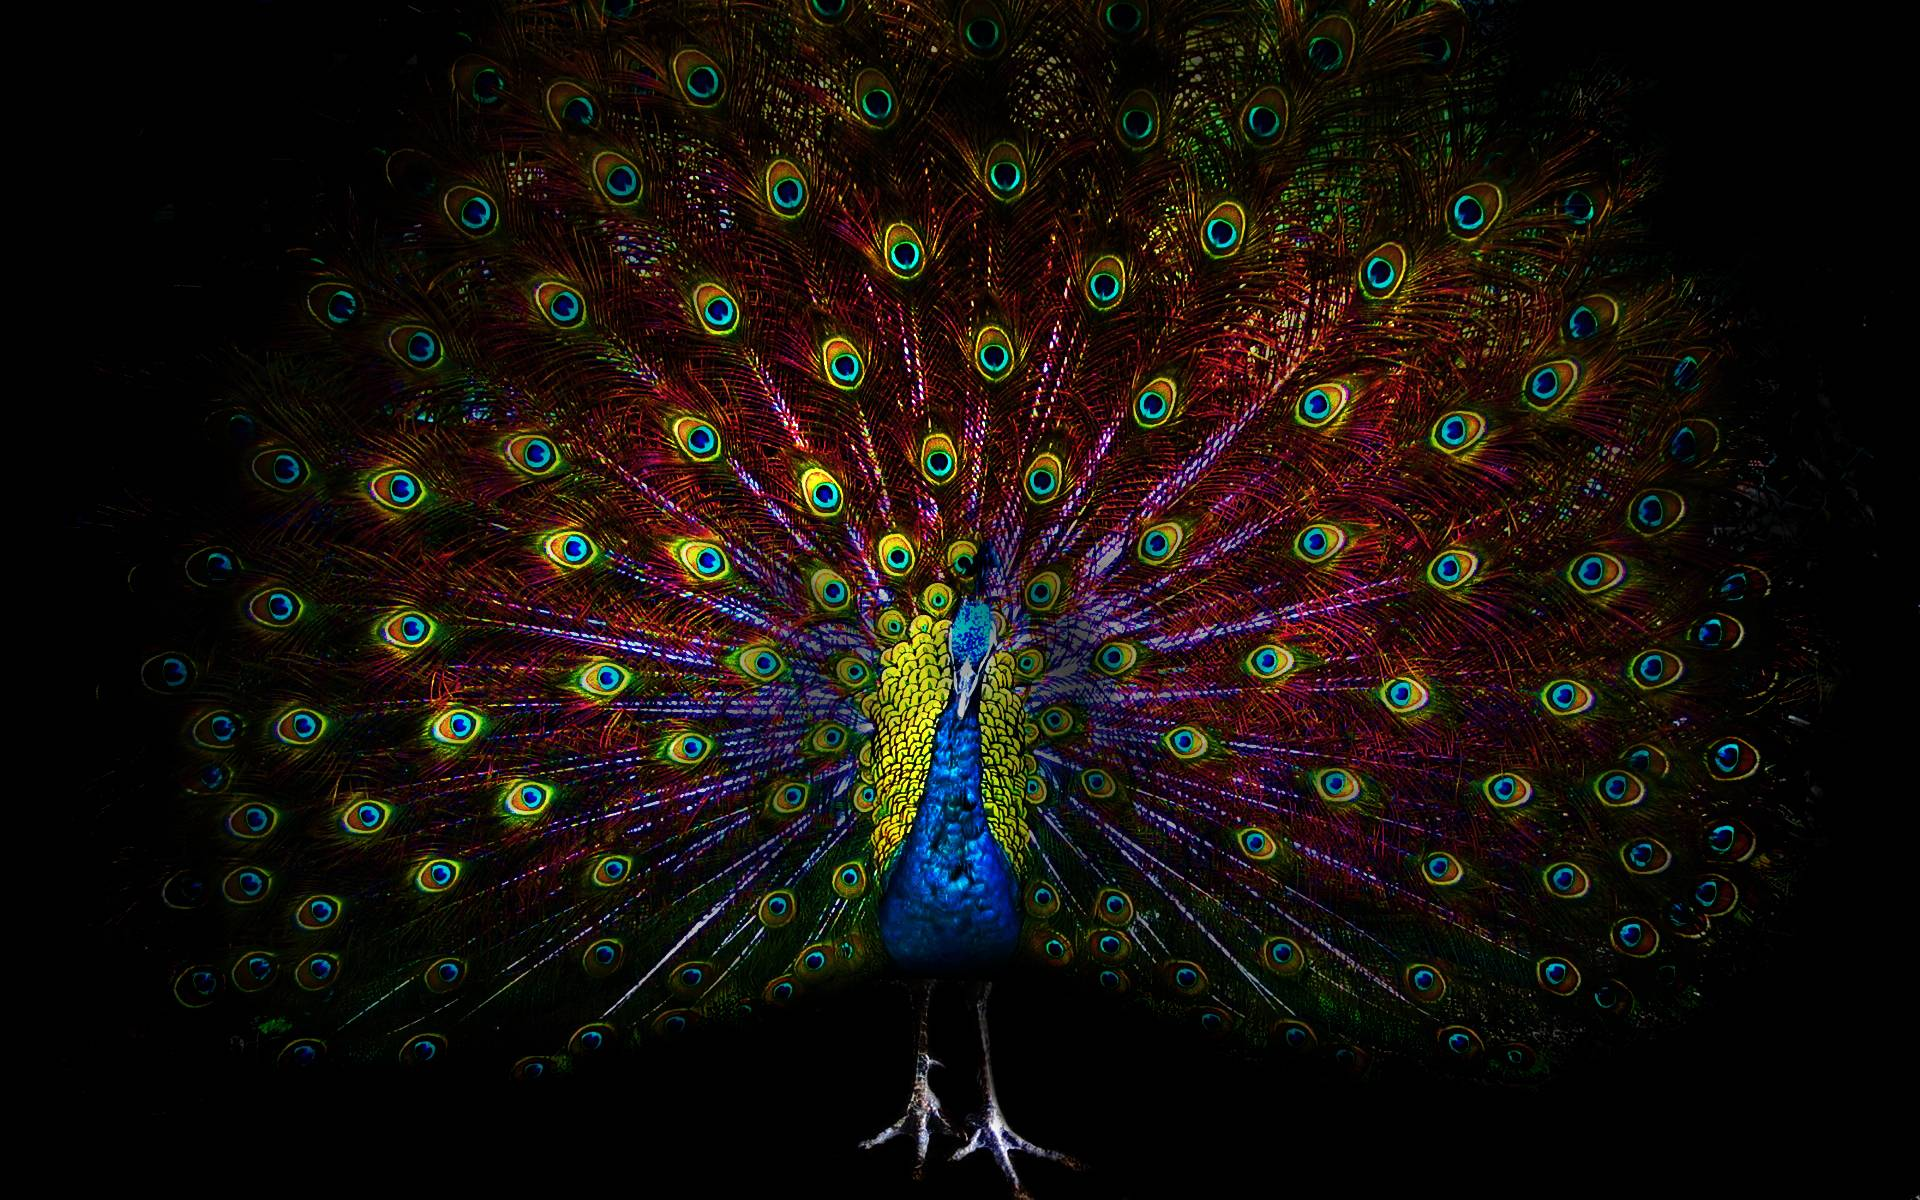 Peacock Wallpapers hd